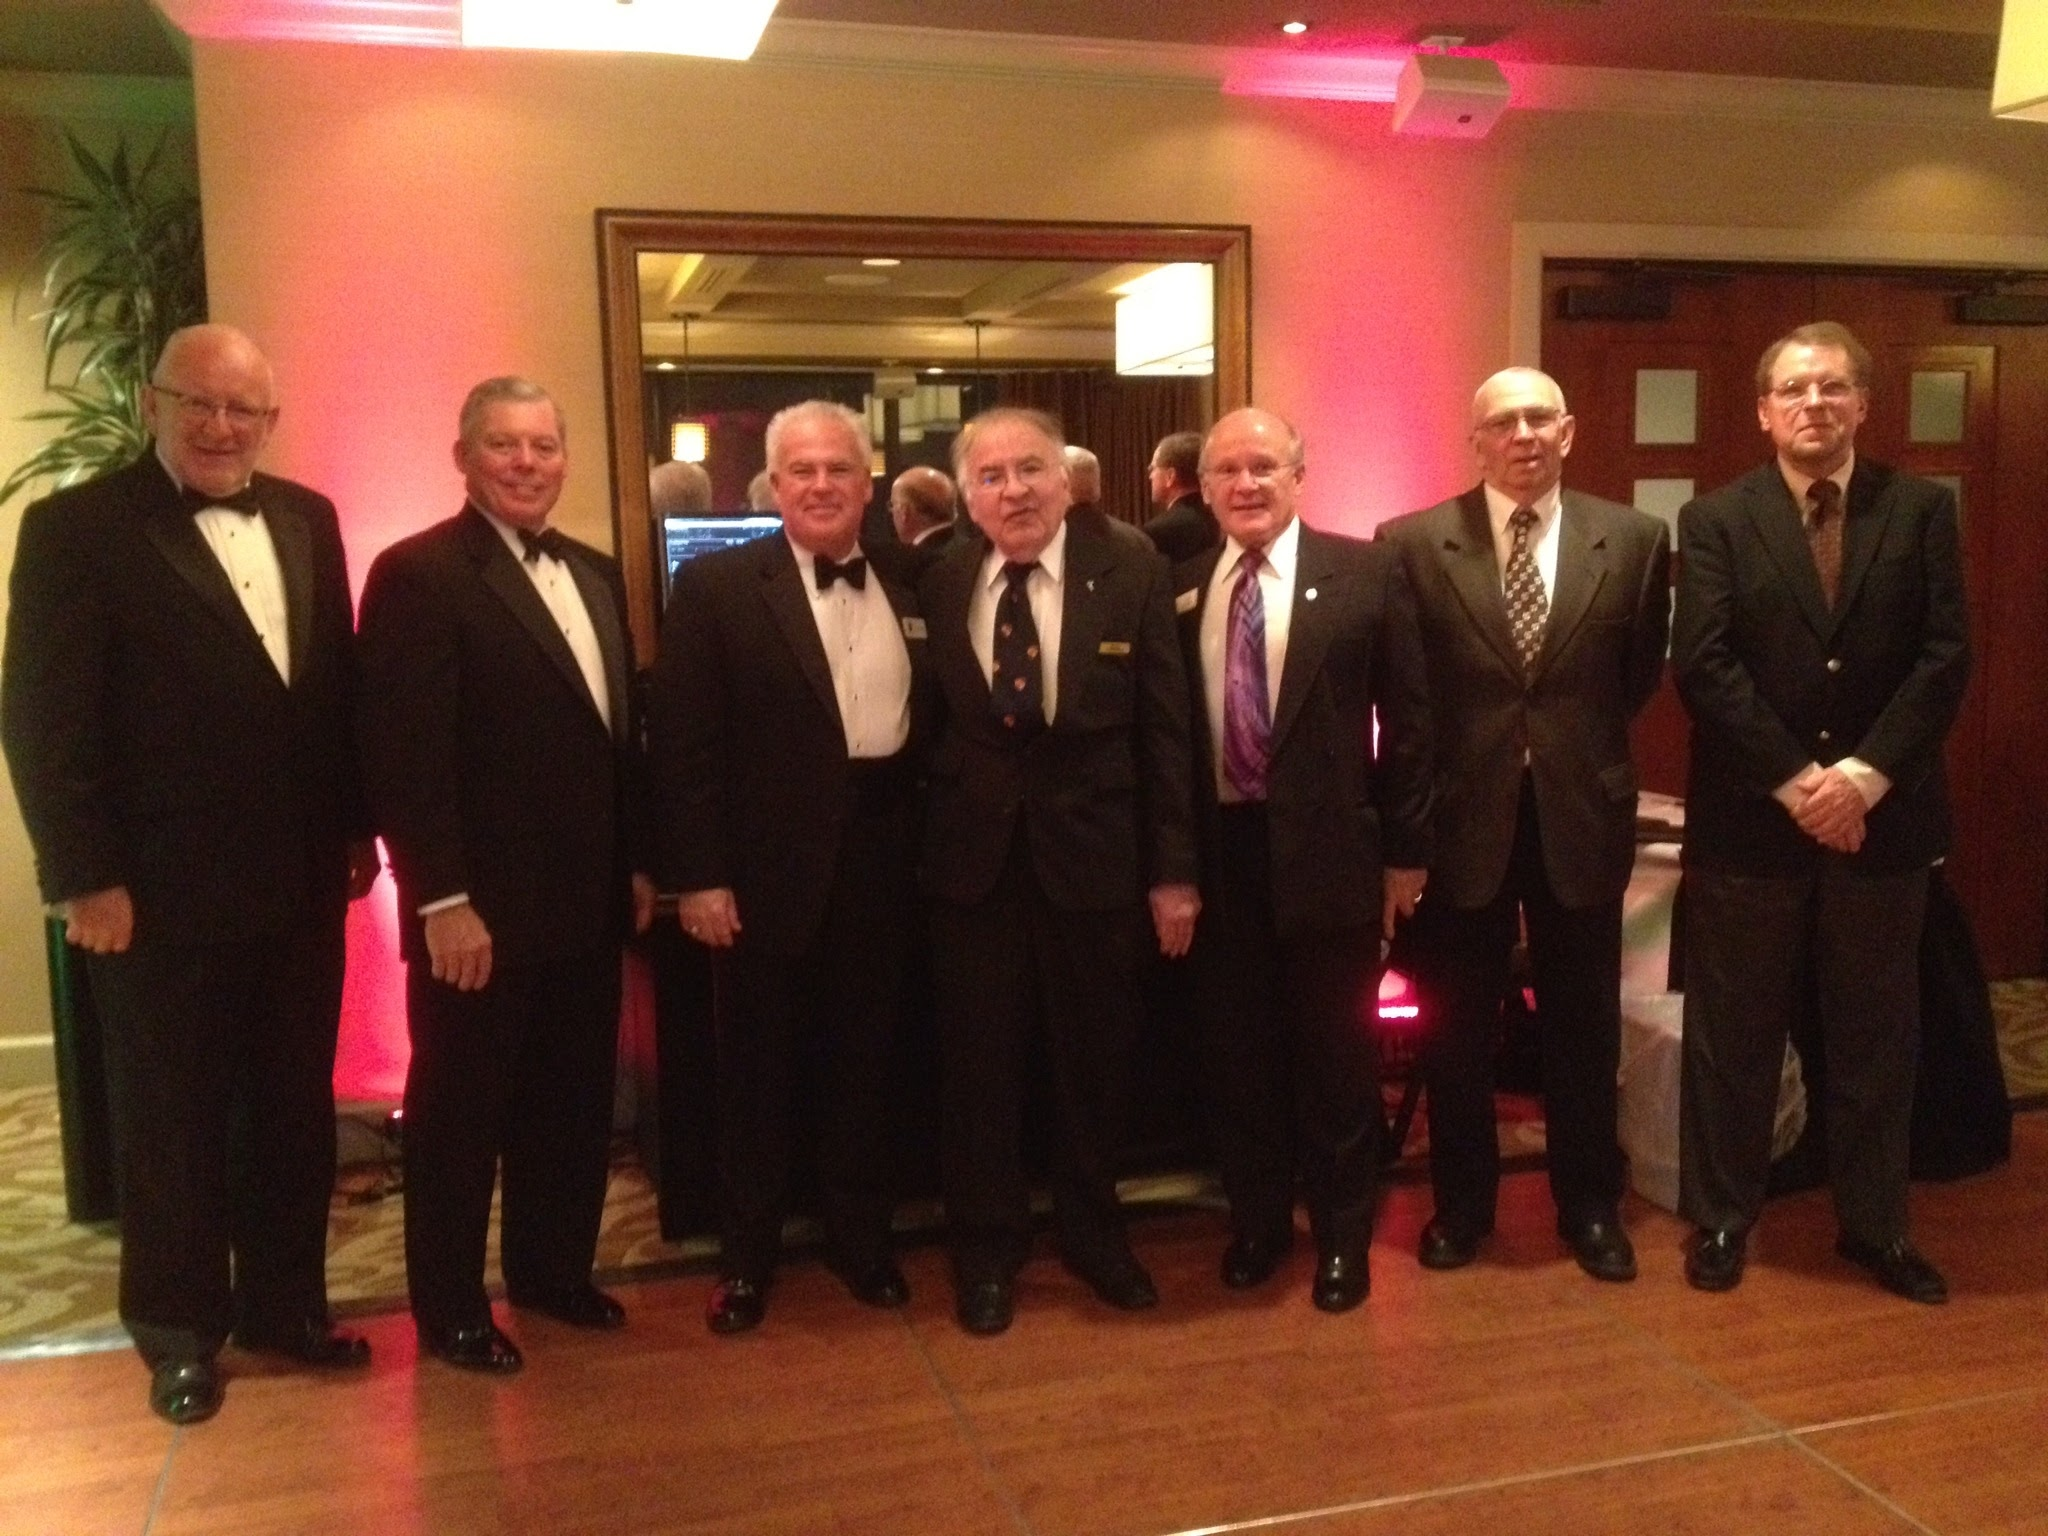 Former CIR Presidents: Tom Brentlinger, Don Shuck, Rob Fike, Mike Robbins, Bob Snider, Philip Allgood and Larry Haskett.